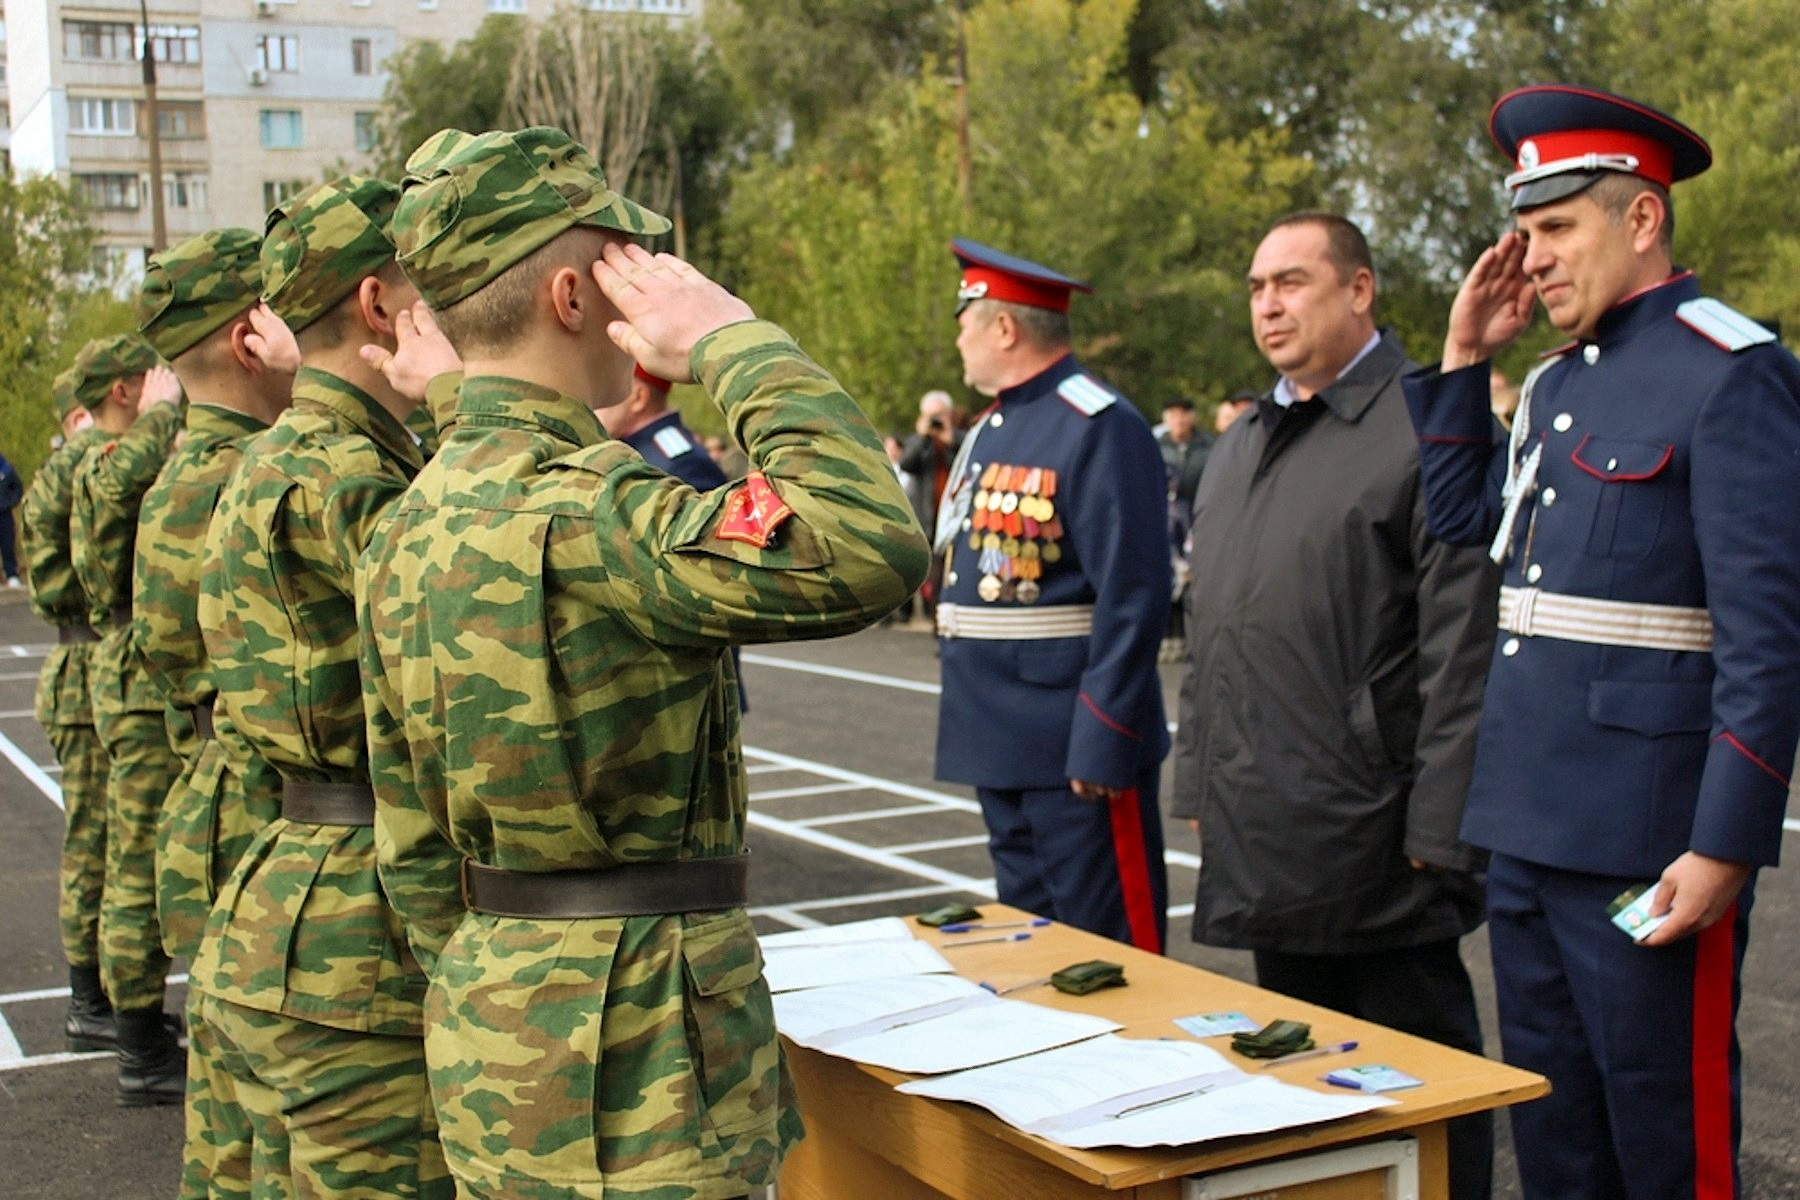 00 lugansk pr lnr cossack cadet corps 01 191015